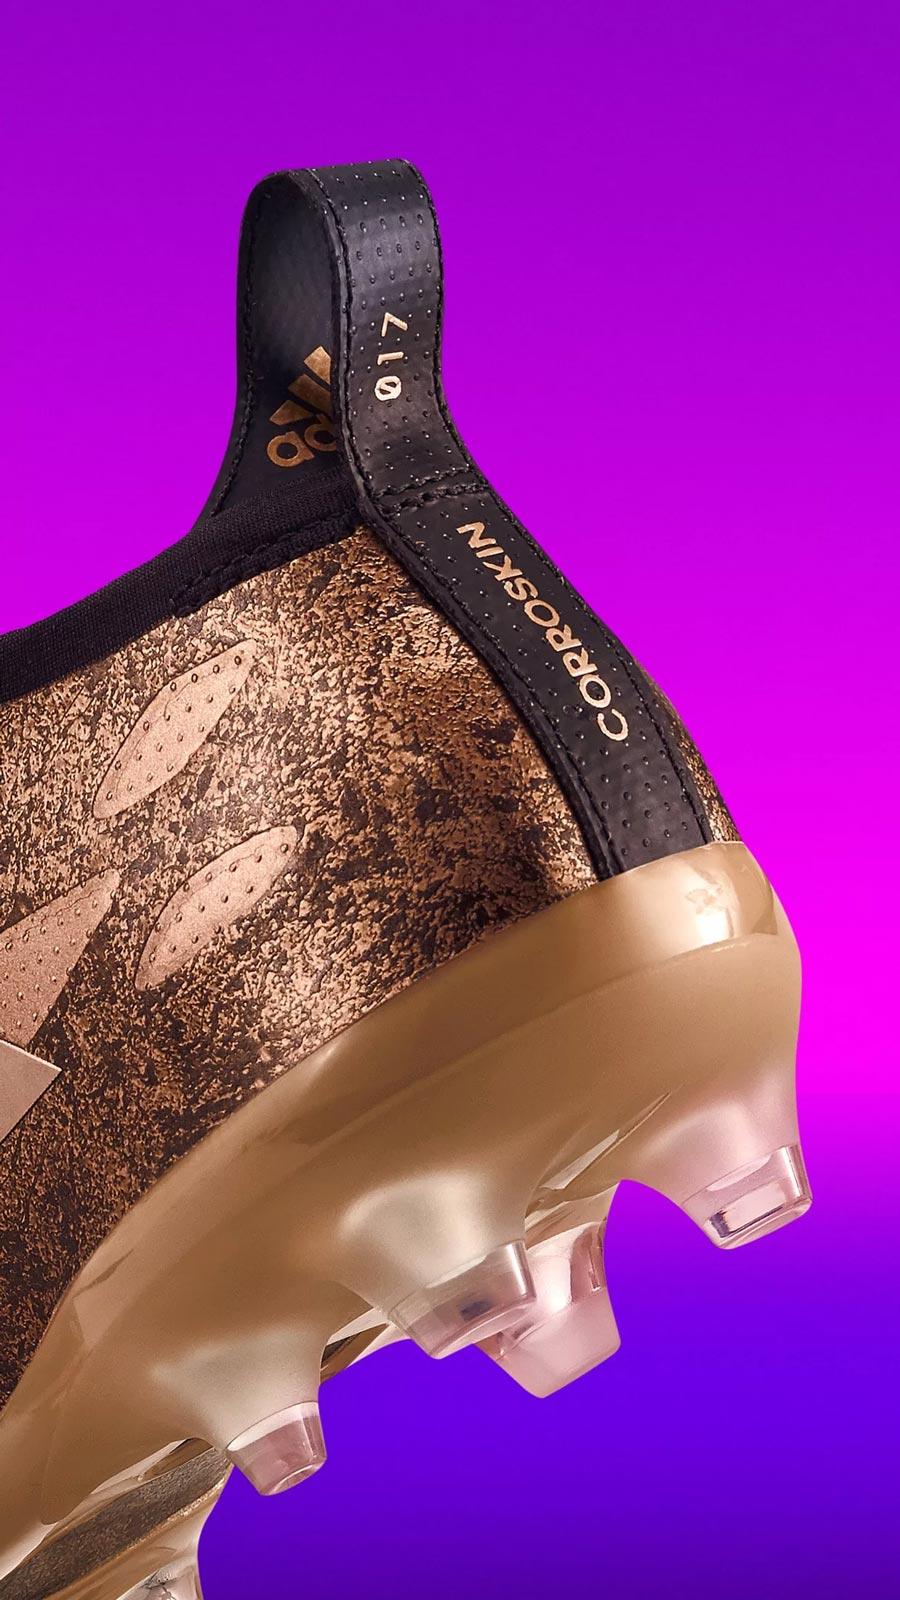 Gold Adidas Glitch Corrozone 2017 Boots Released - Footy ...